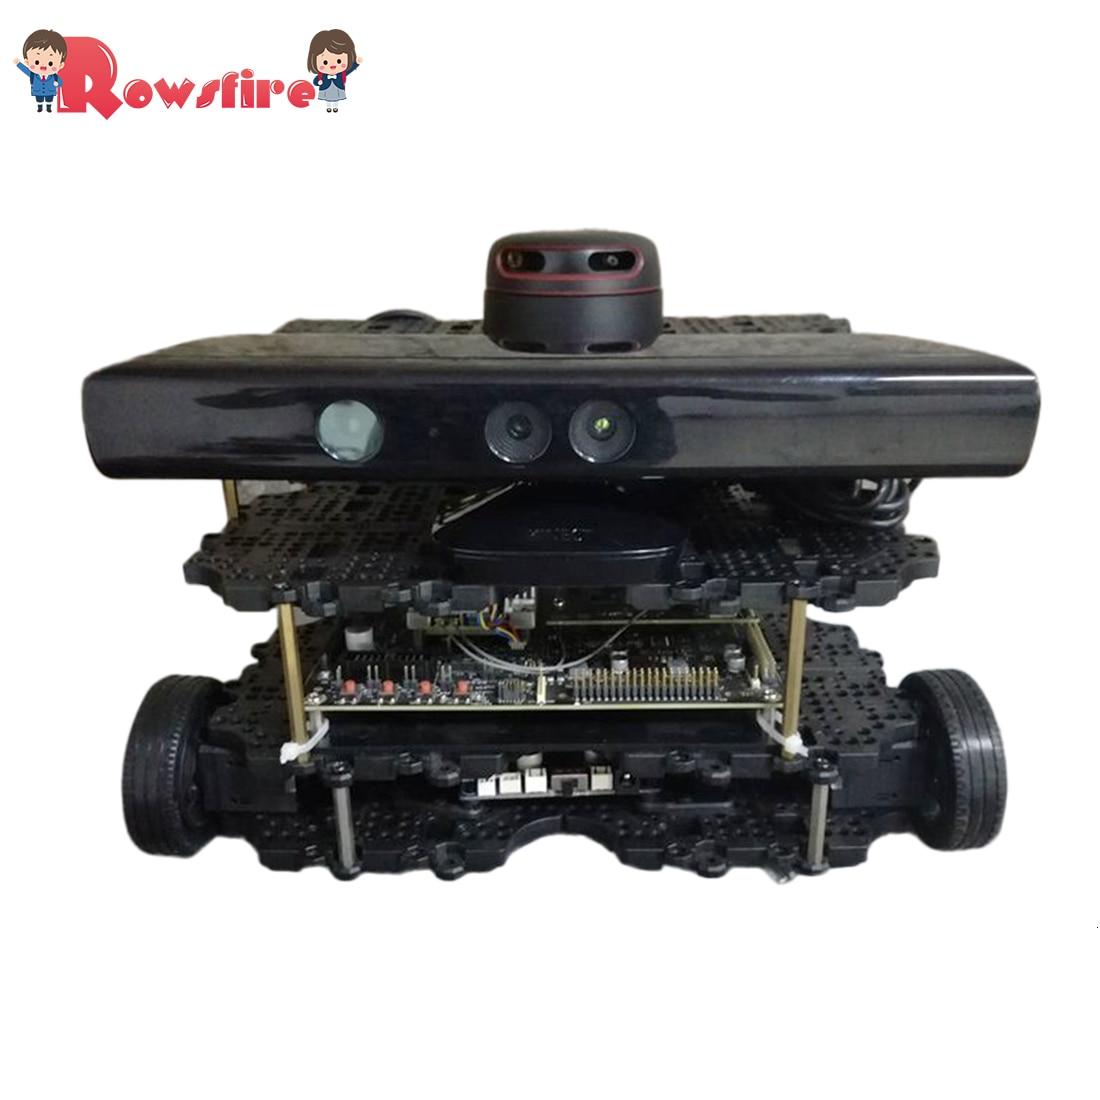 DIY High Quality Waffle Version Robot Operating System Autopilot Robot Car Open Source Kit